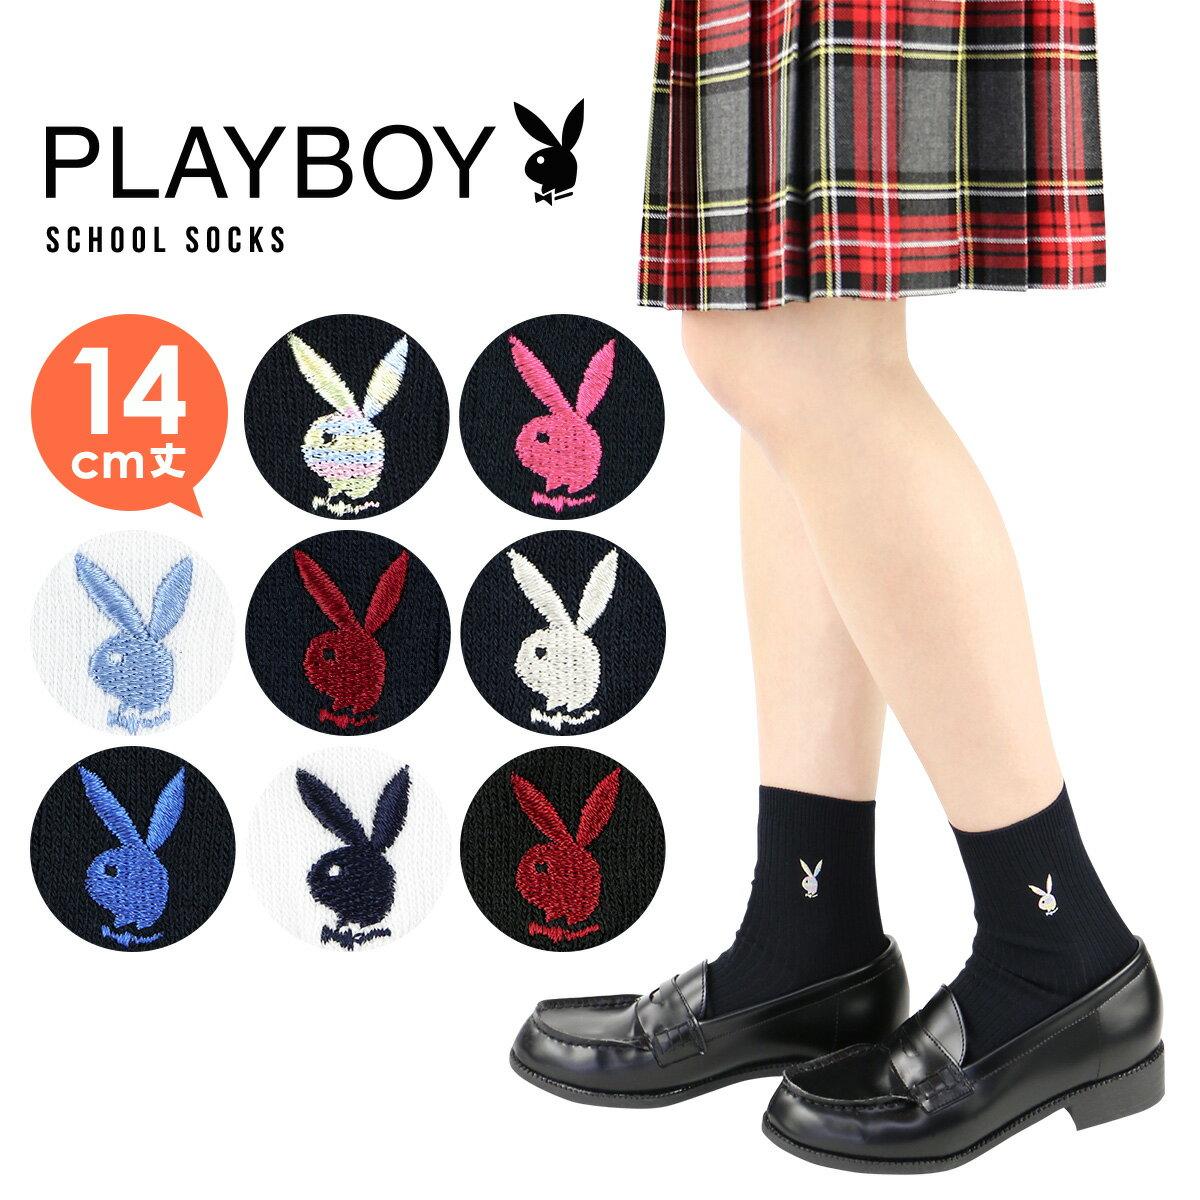 PLAYBOY (プレイボーイ) 14cm丈 スクールソックスワンポイント 両面刺繍入り リブ レディス クルーソックス 靴下 3737-350ポイント10倍